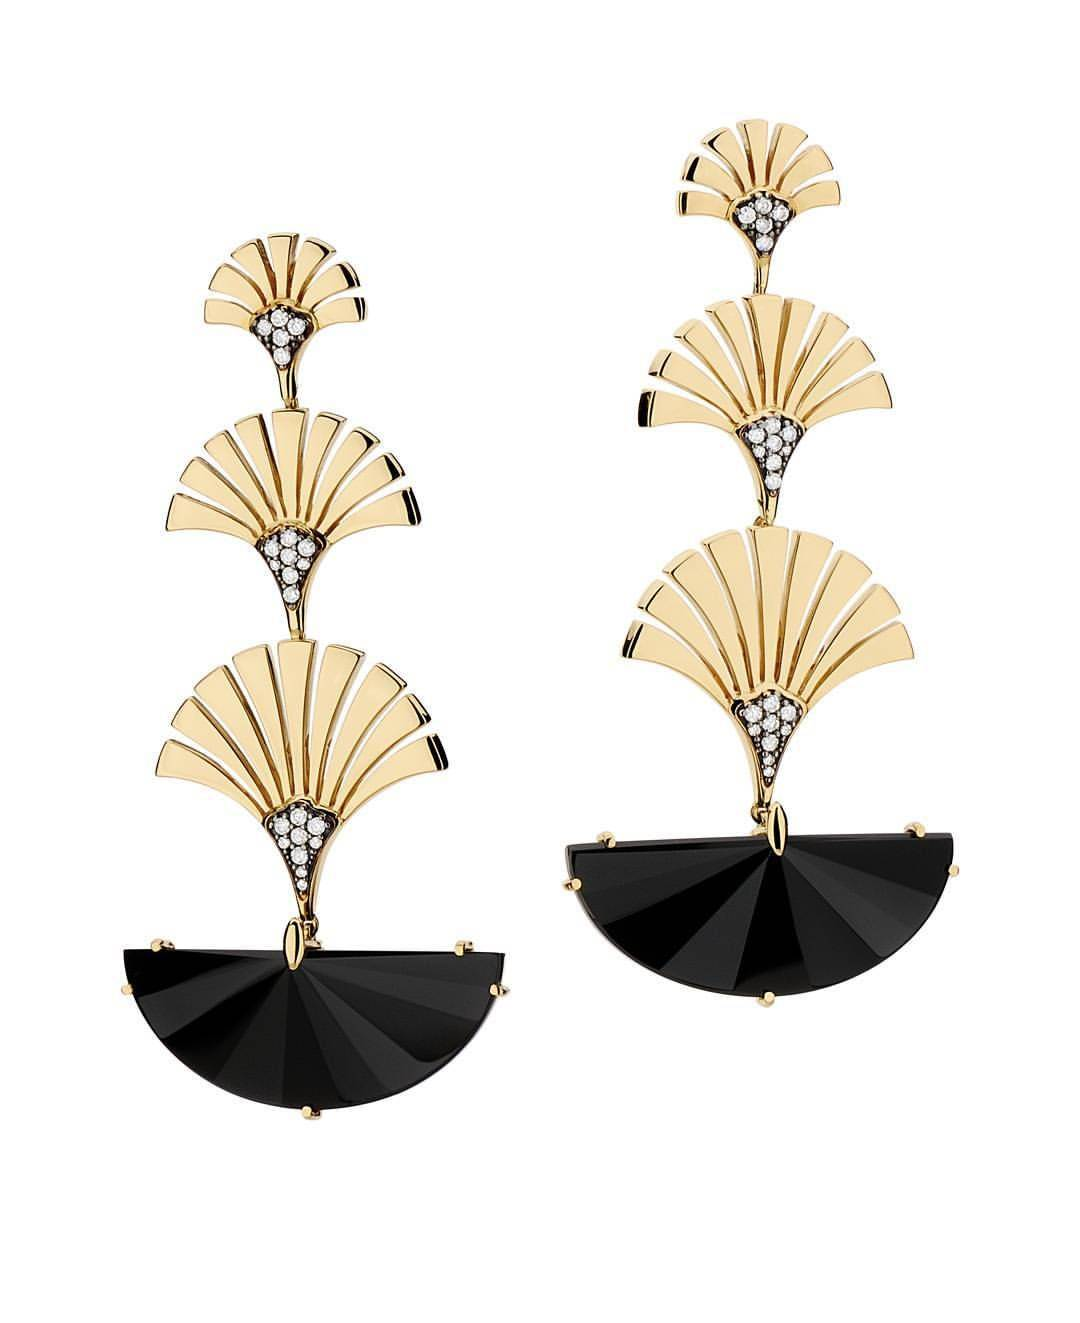 Art deco jewelry-369365606929456470